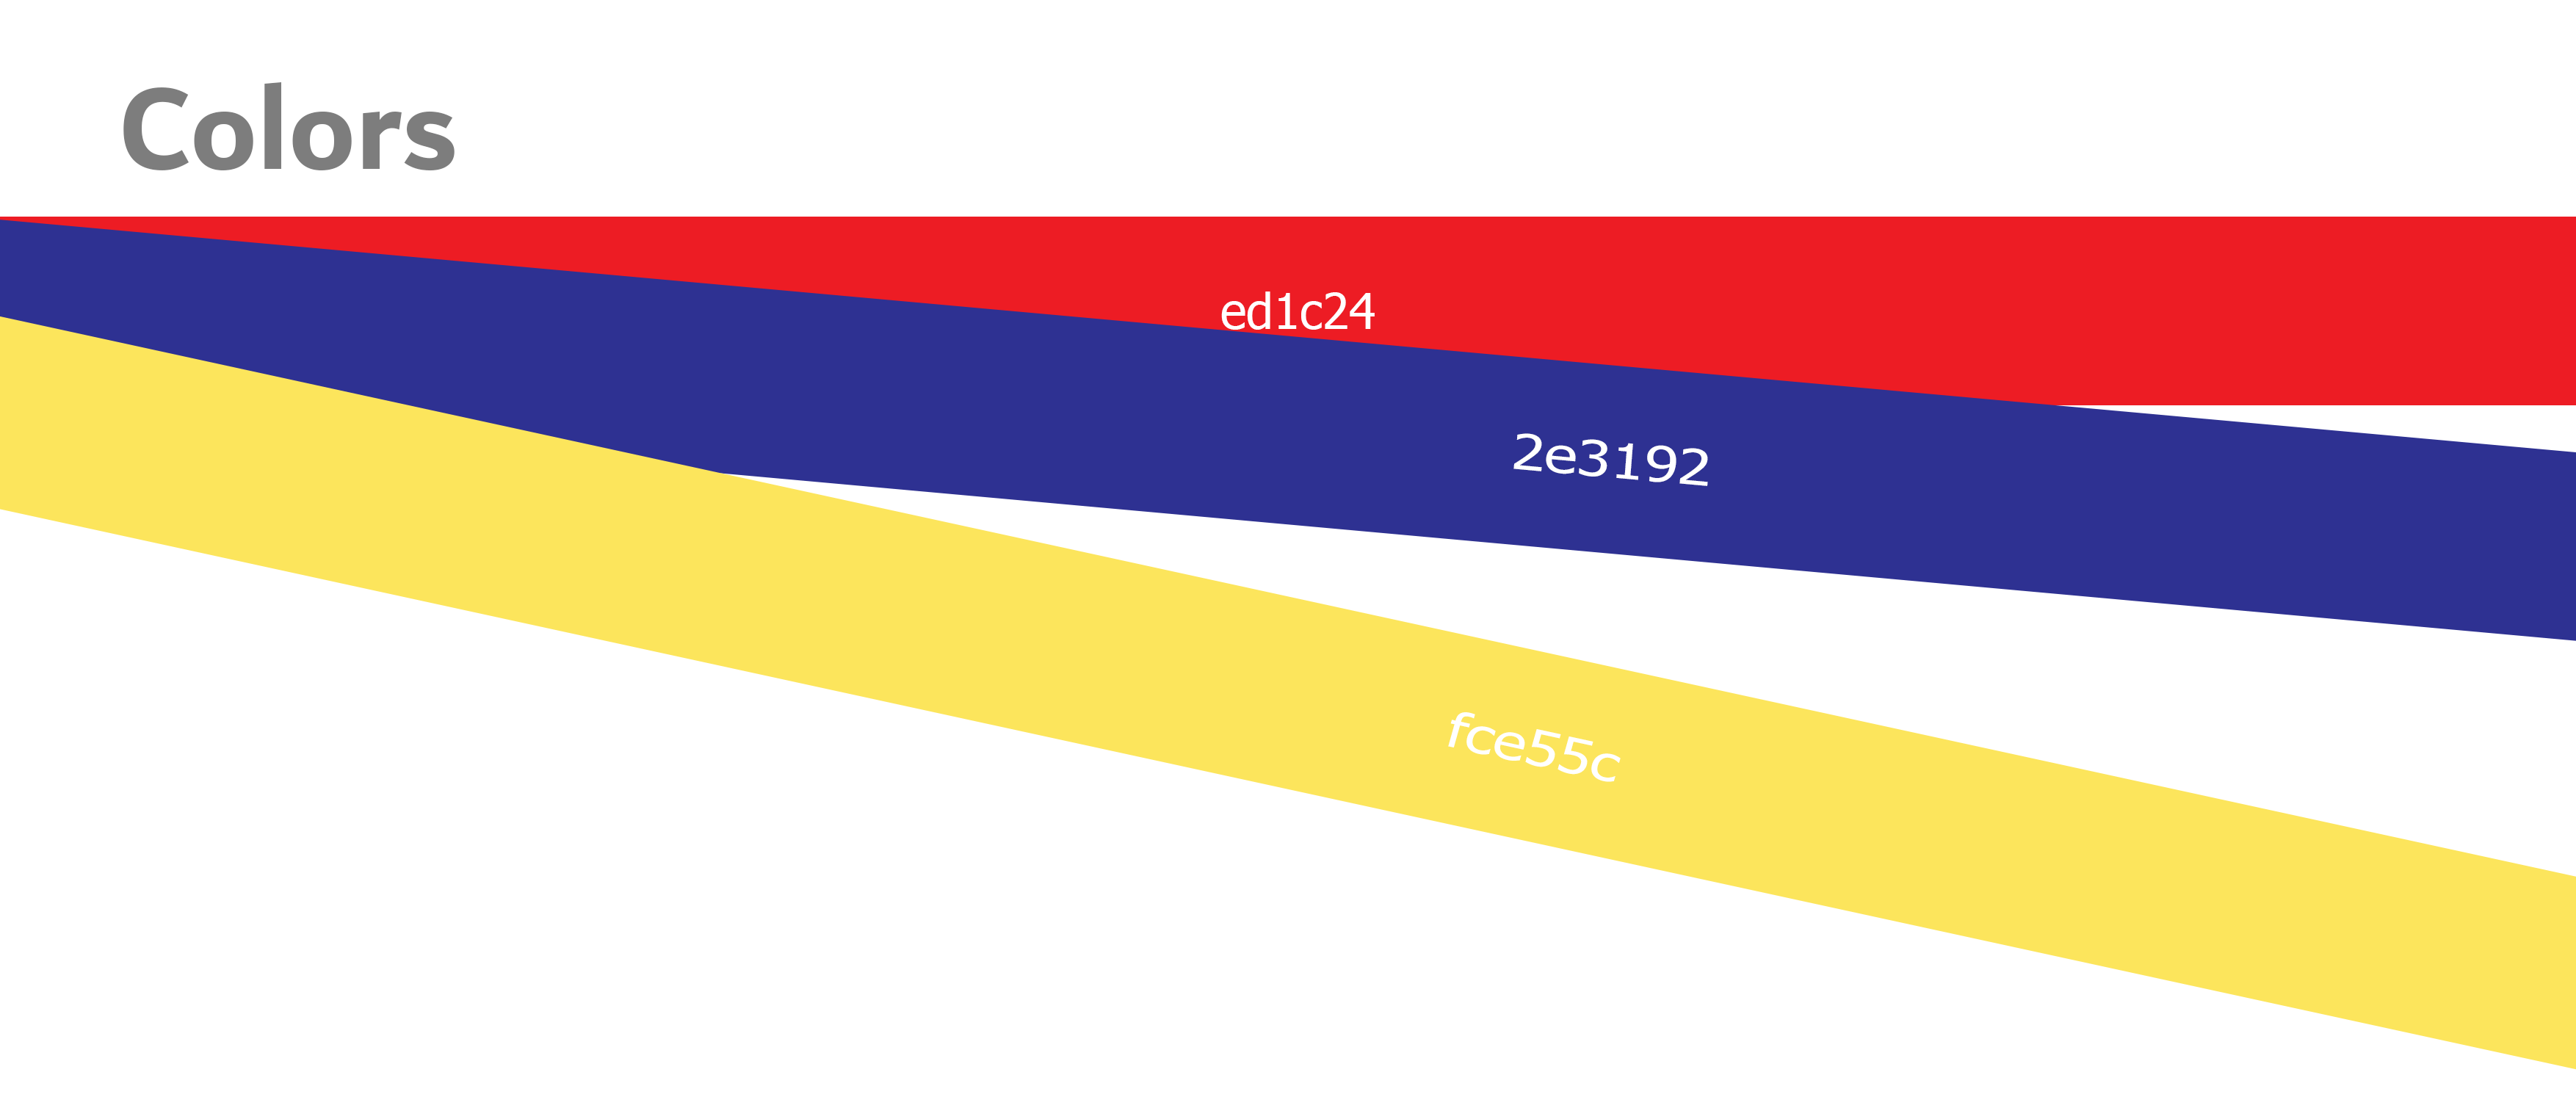 litaearafuu logo colors 02 momenarts